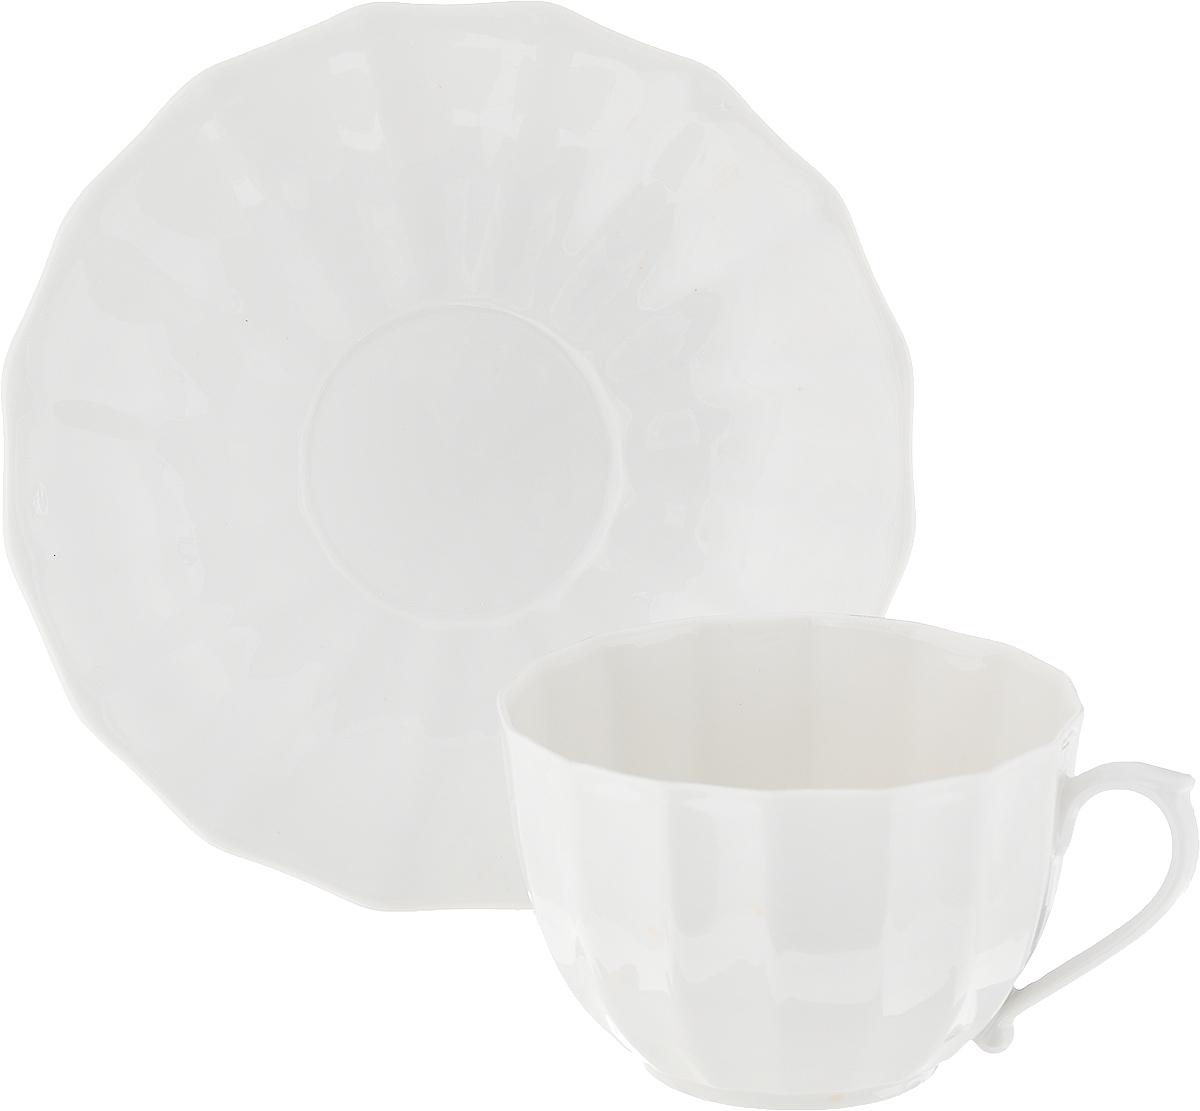 Чайная пара Фарфор Вербилок. 798400Б чайная пара фарфор вербилок маки 2 предмета 29951530